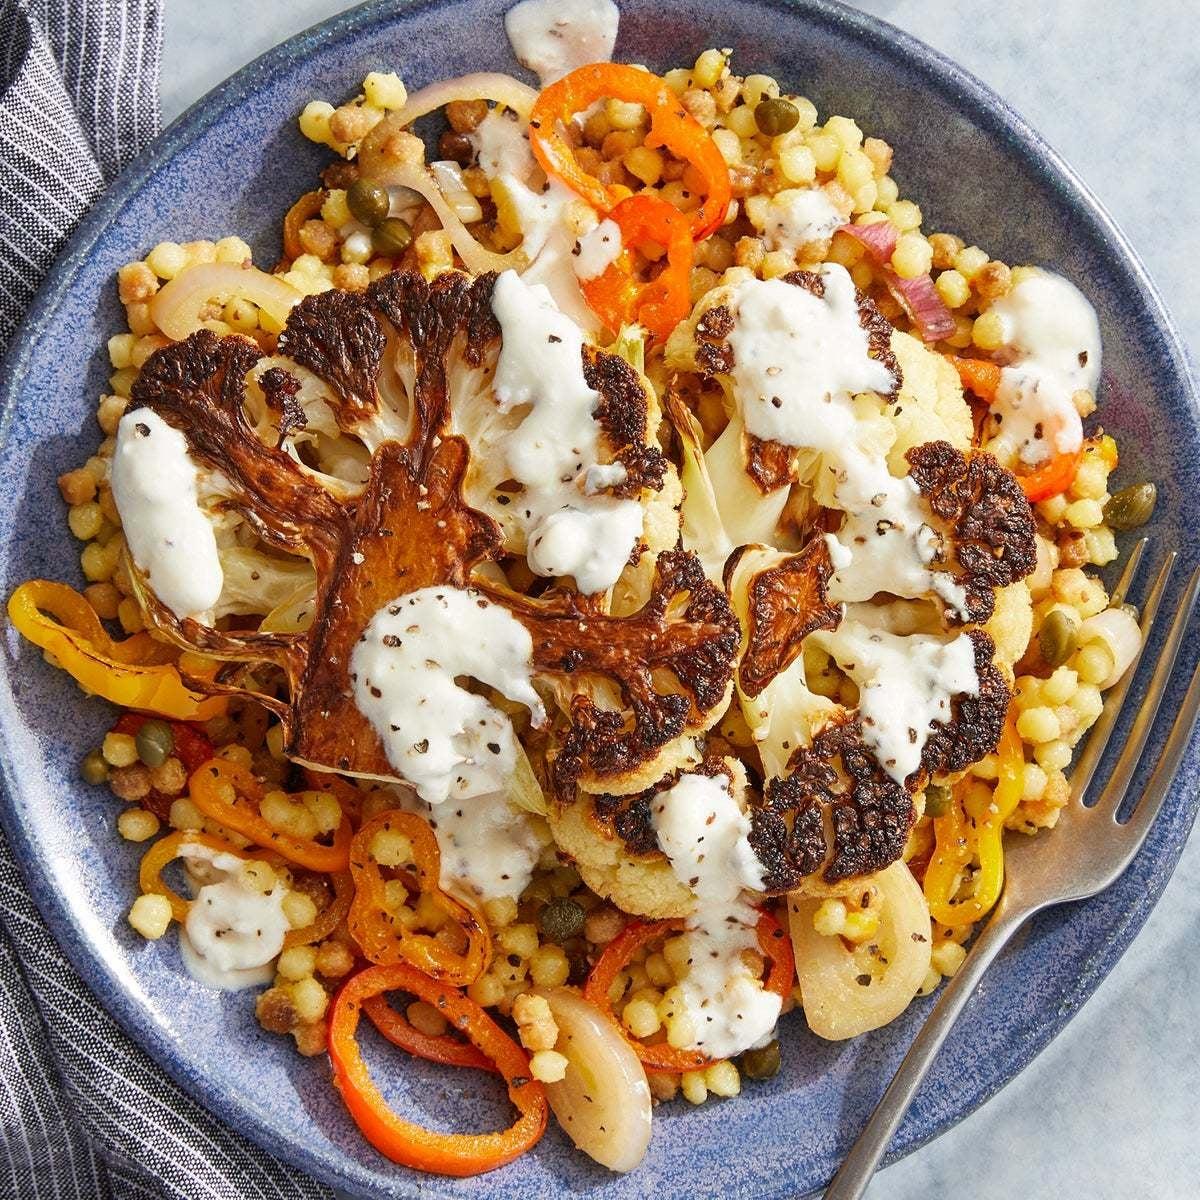 Roasted Cauliflower & Saffron Pasta with Goat Cheese Dressing